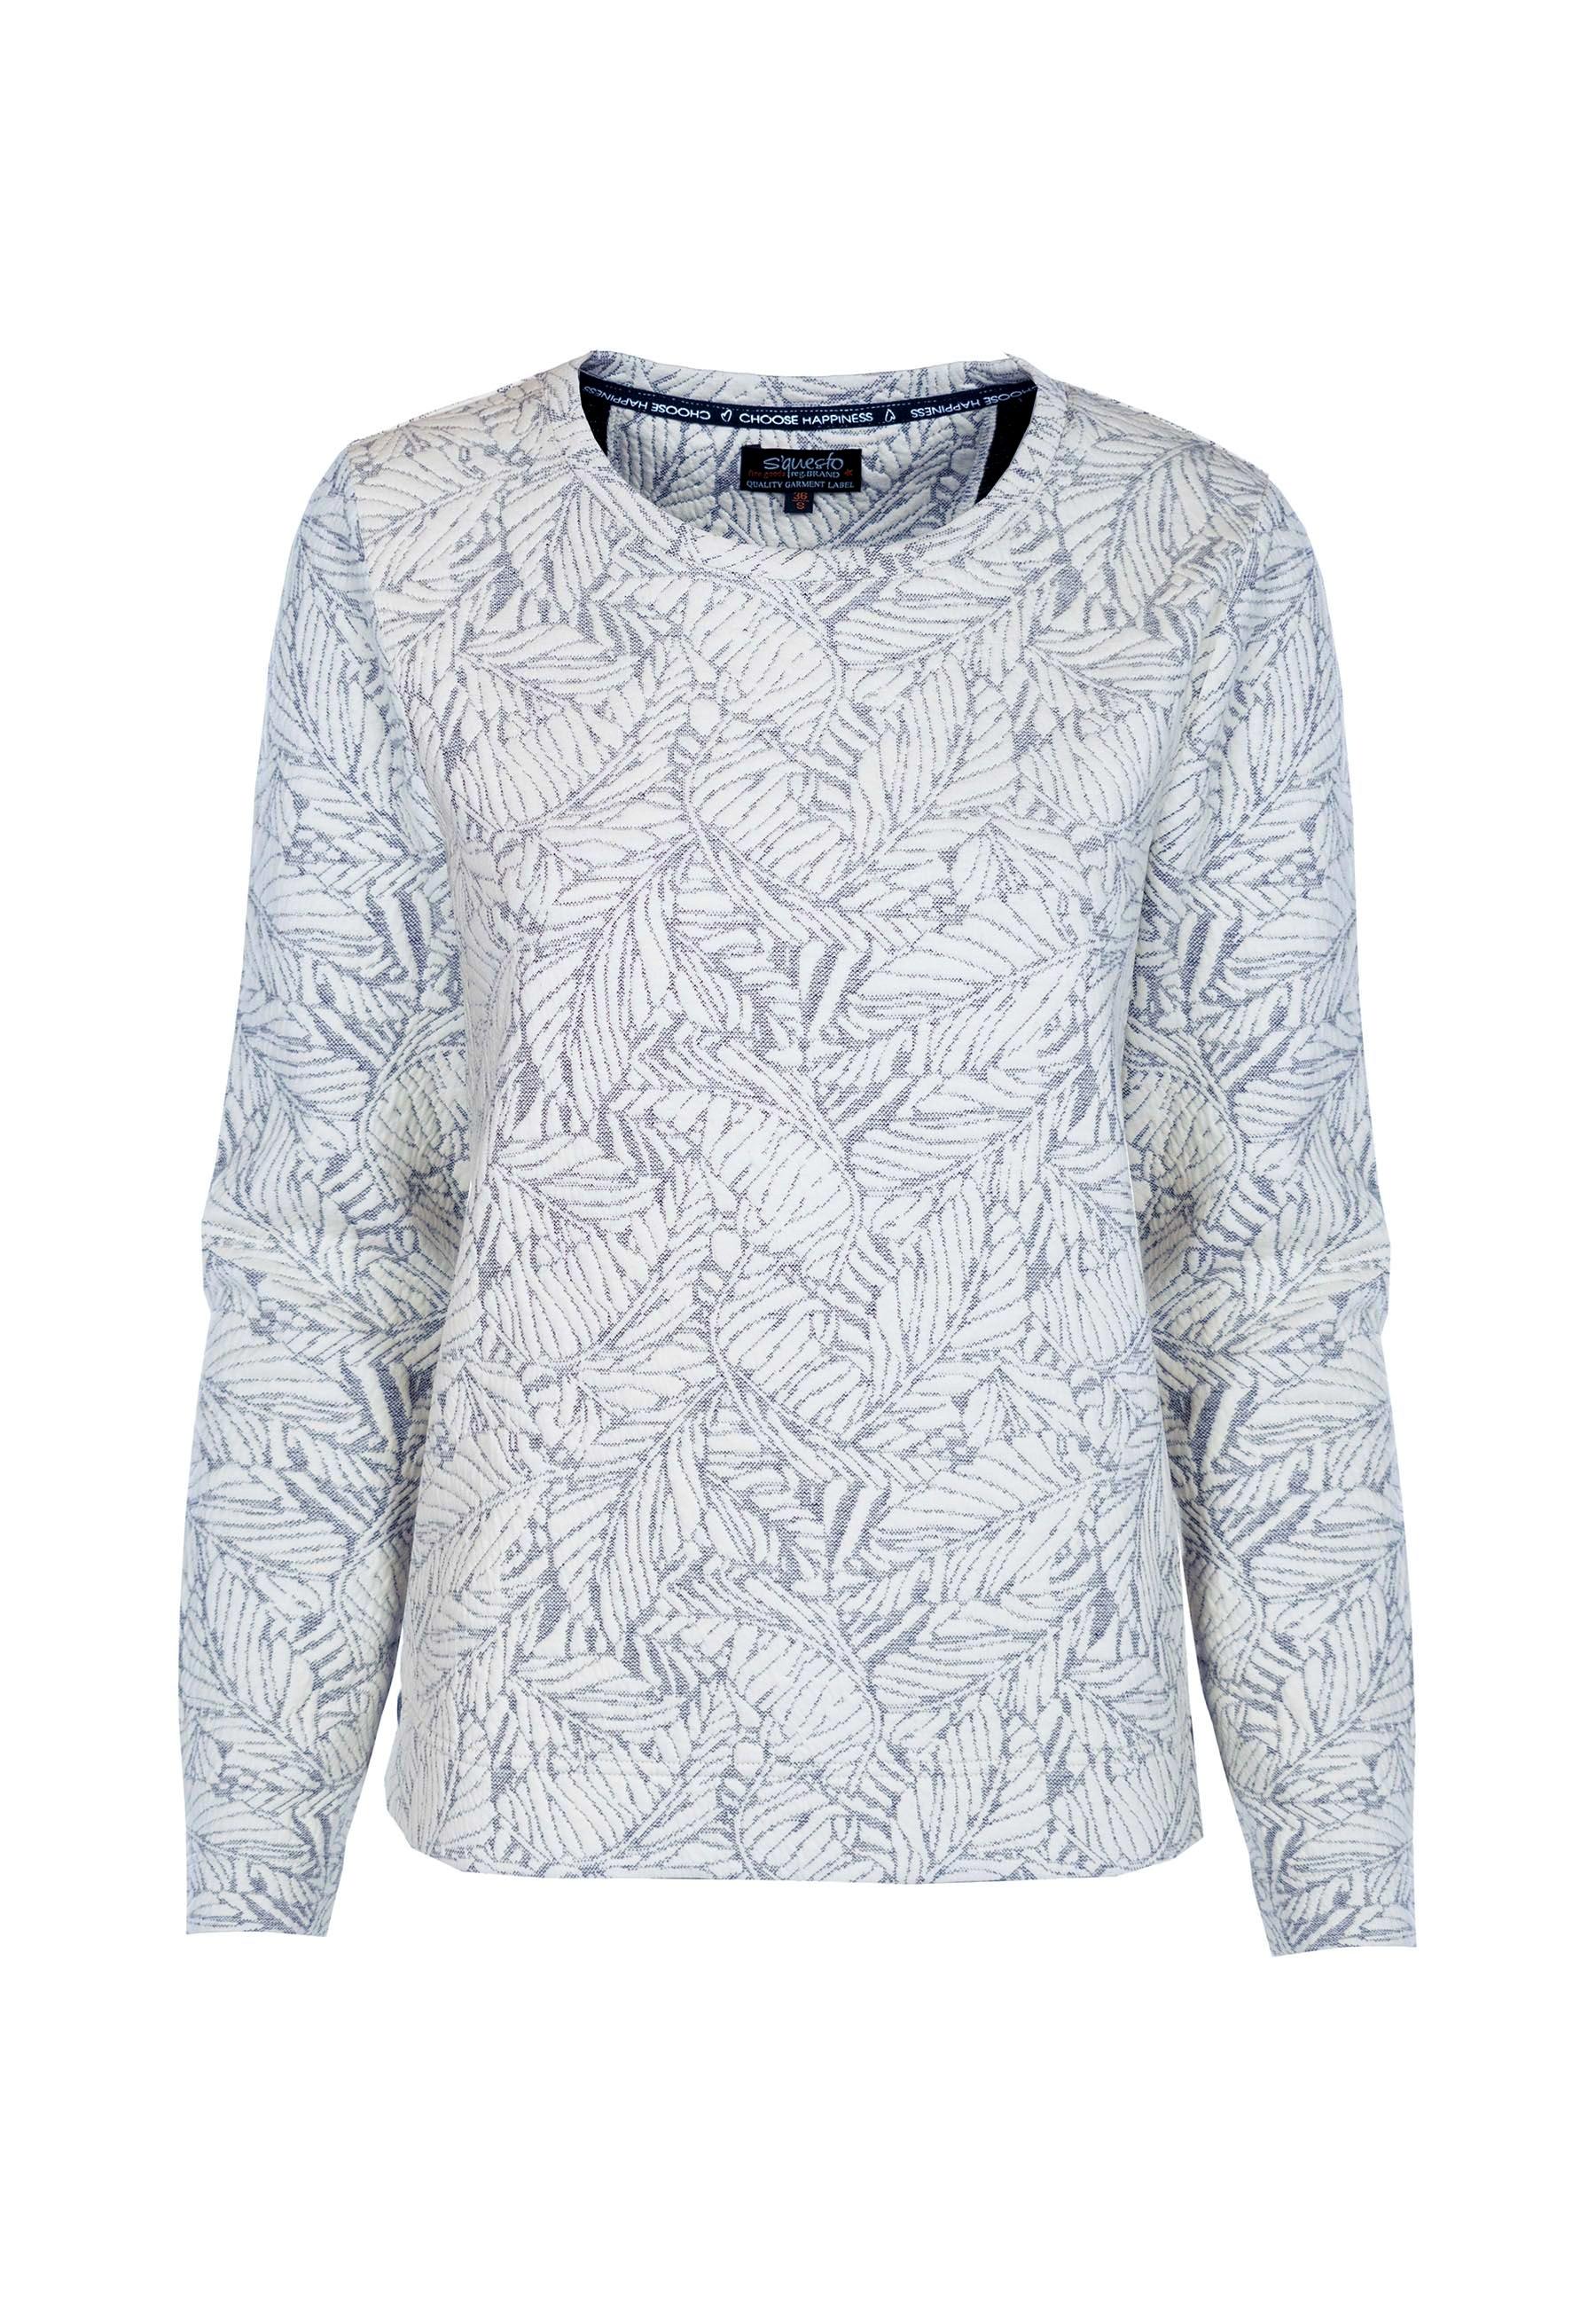 Soquesto Sweatshirt Lana